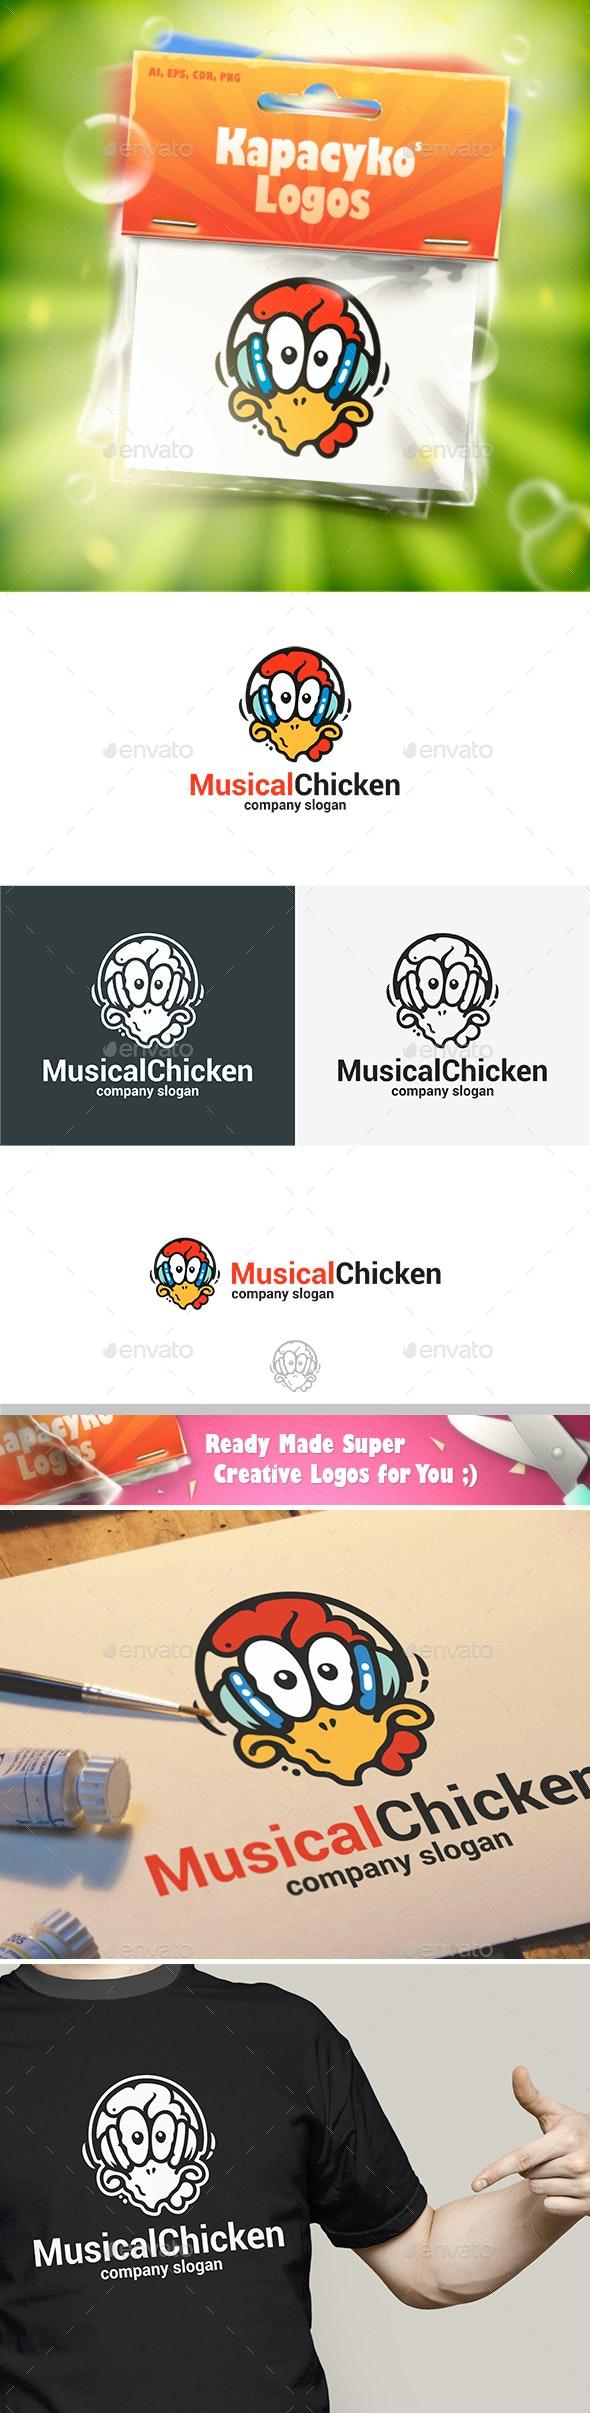 Musical Chicken in Headphones Logo - Animals Logo Templates